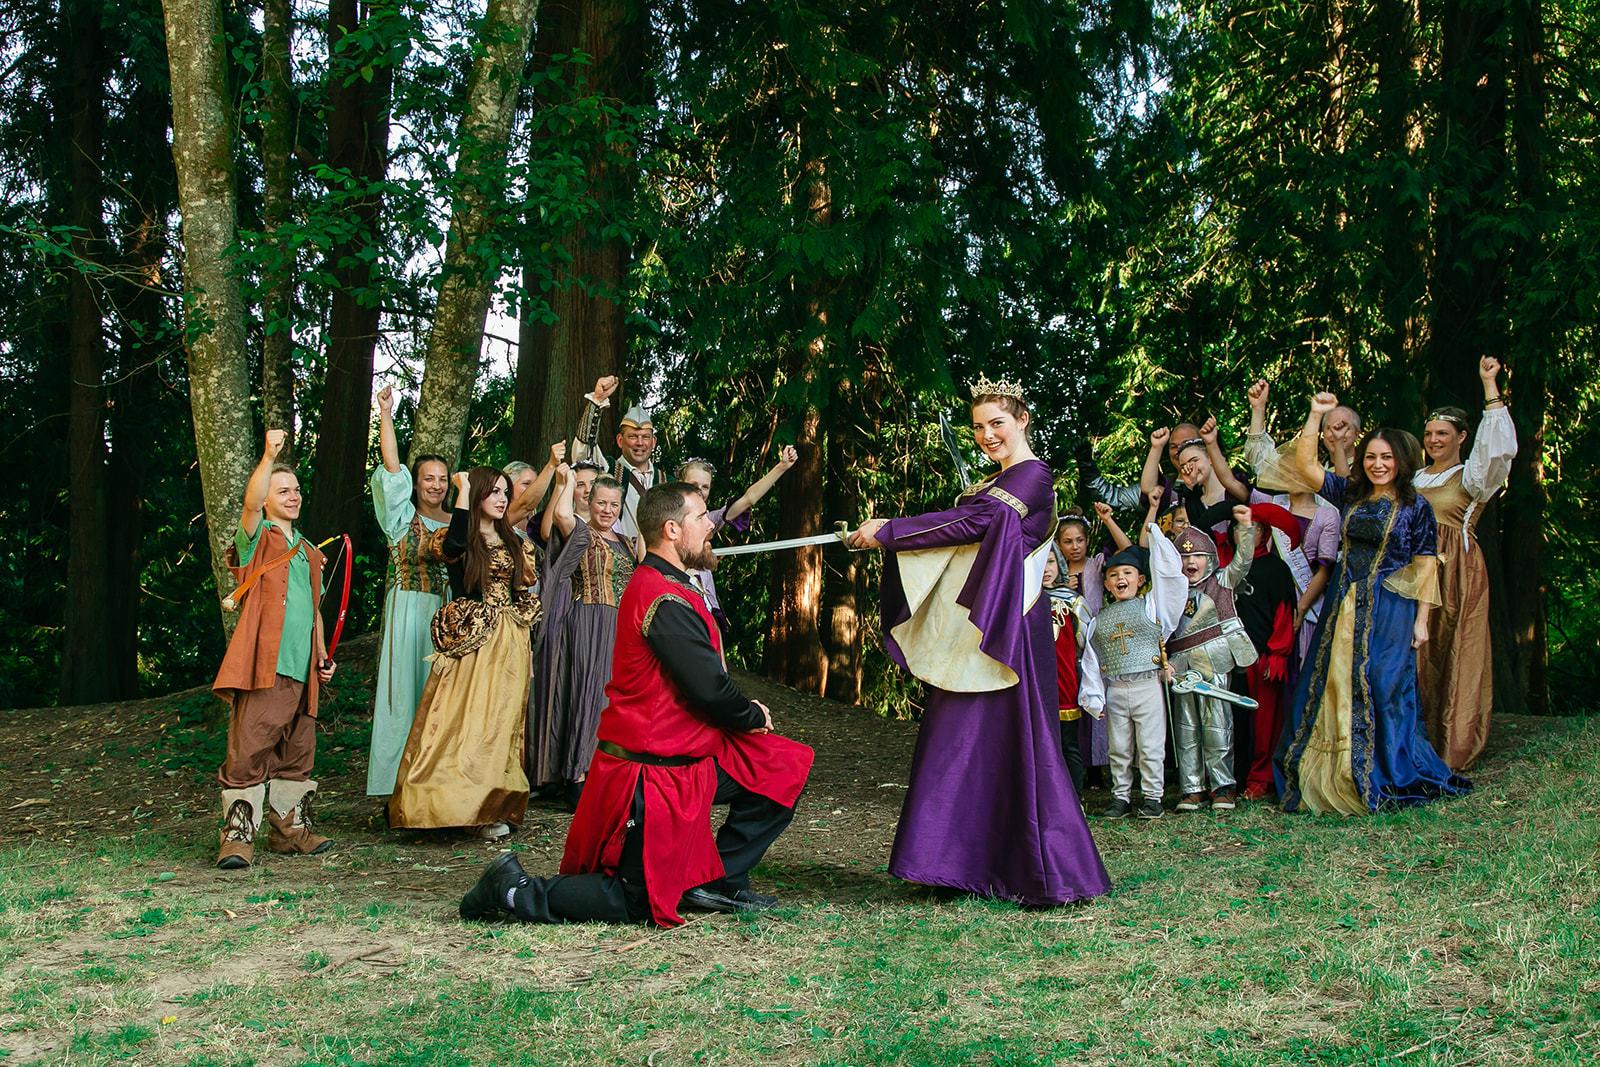 Sherwood Robin Hood Festival 2021 - Sherwood Robin Hood Festival 2021